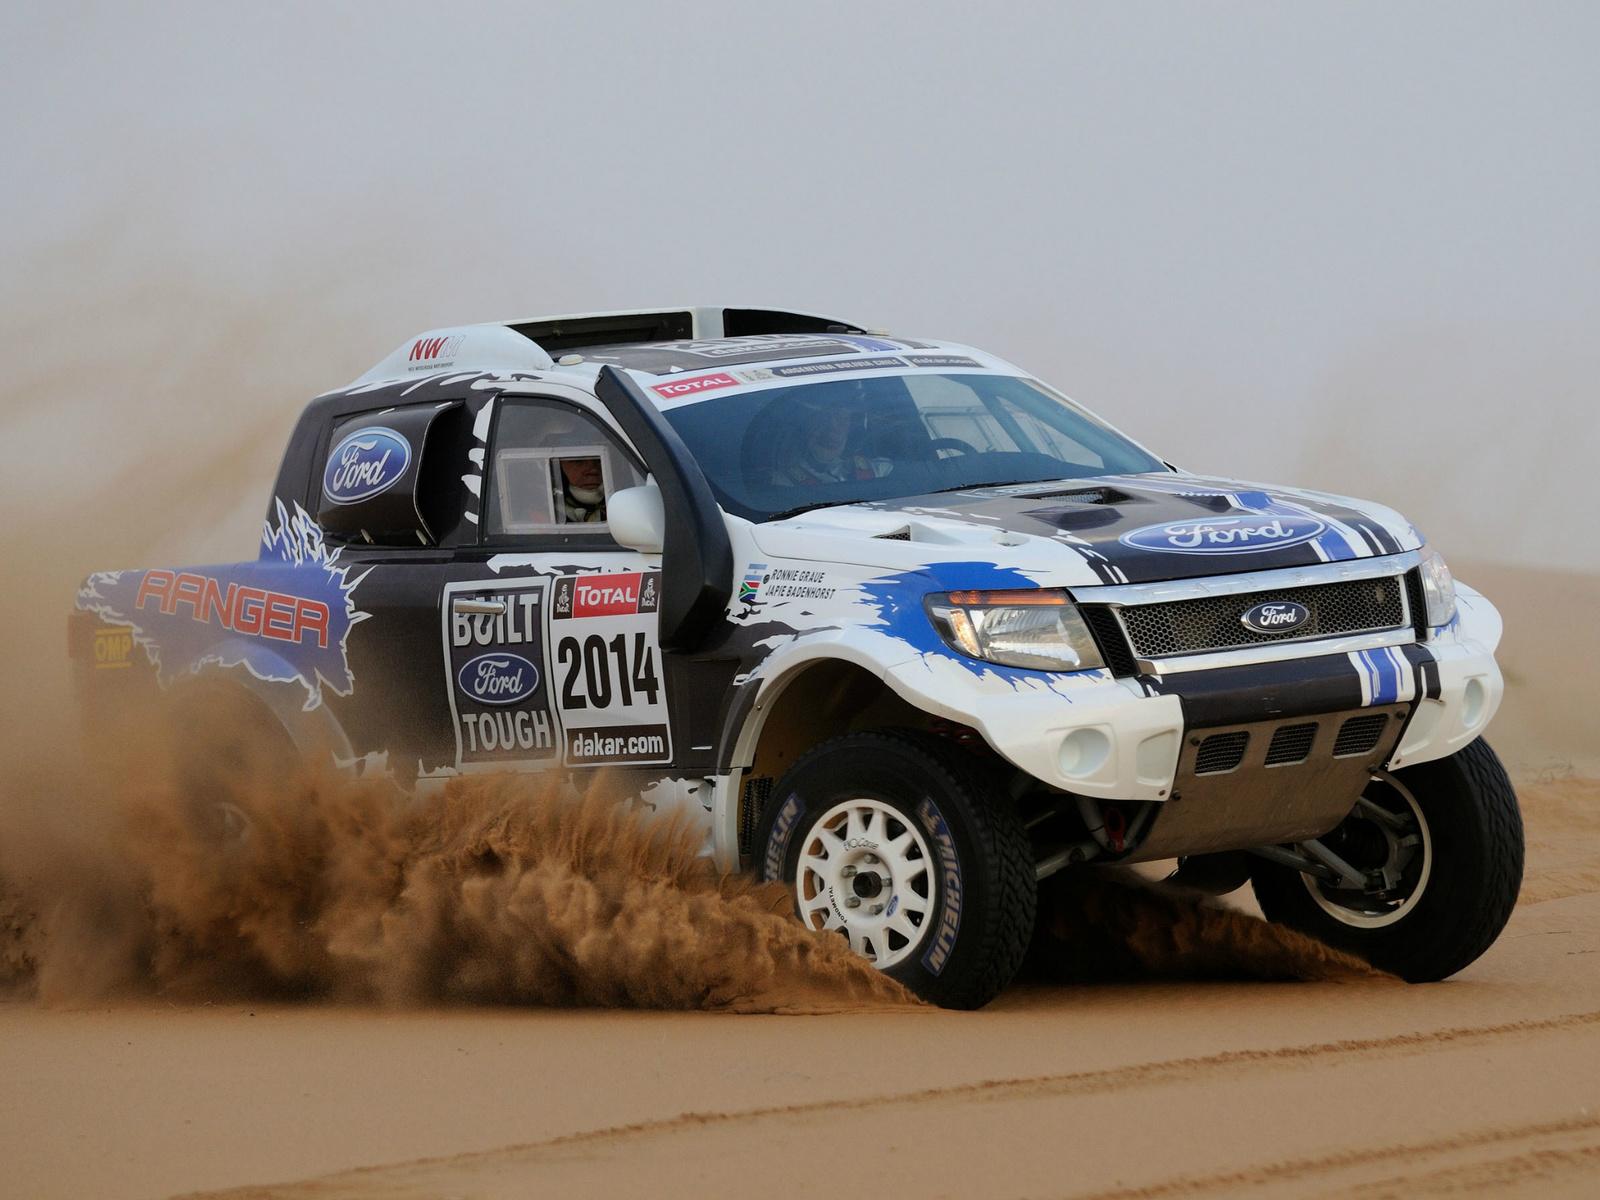 Ford Ranger Dakar Rally offroad pickup 4x4 race racing g wallpaper 1600x1200